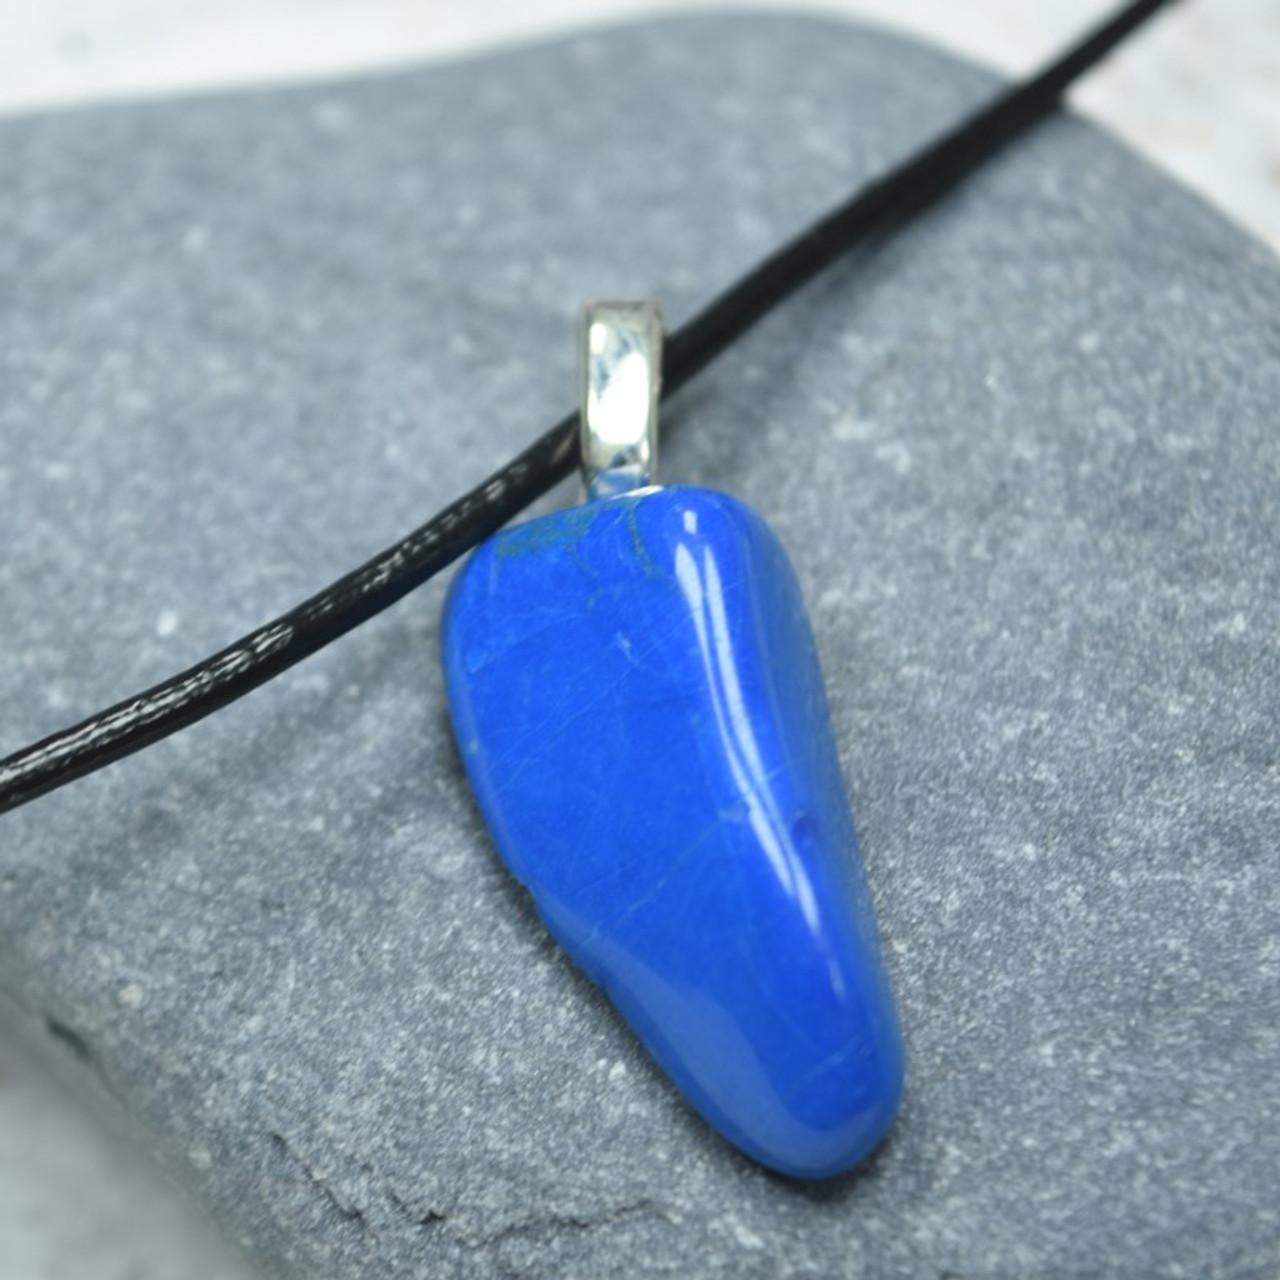 Tumbled Blue Howlite Stone Pendant